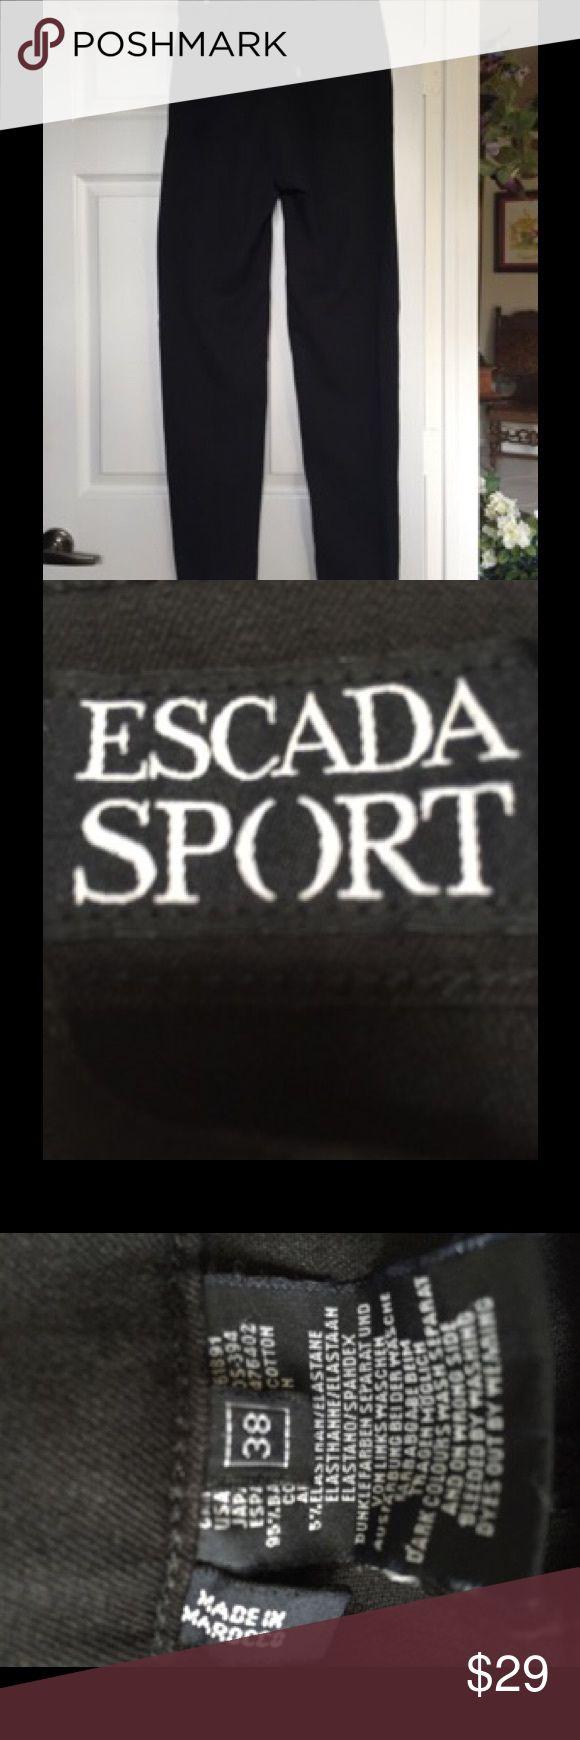 Escada Sport Black Jeans Black denim chains by Escada Sport Escada Sport Jeans Straight Leg